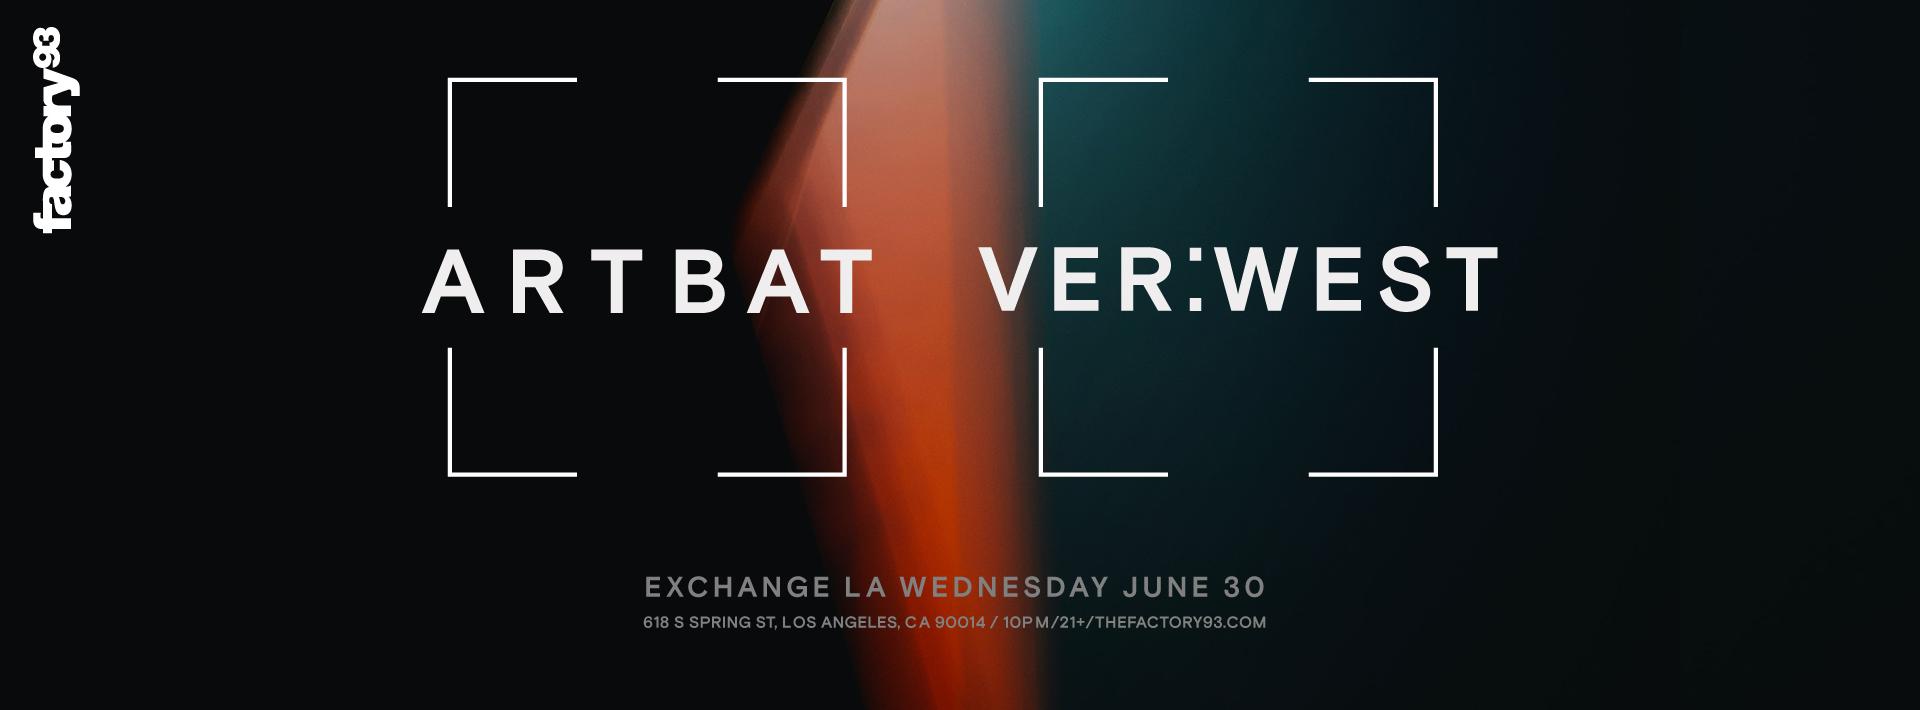 ARTBAT & VER:WEST